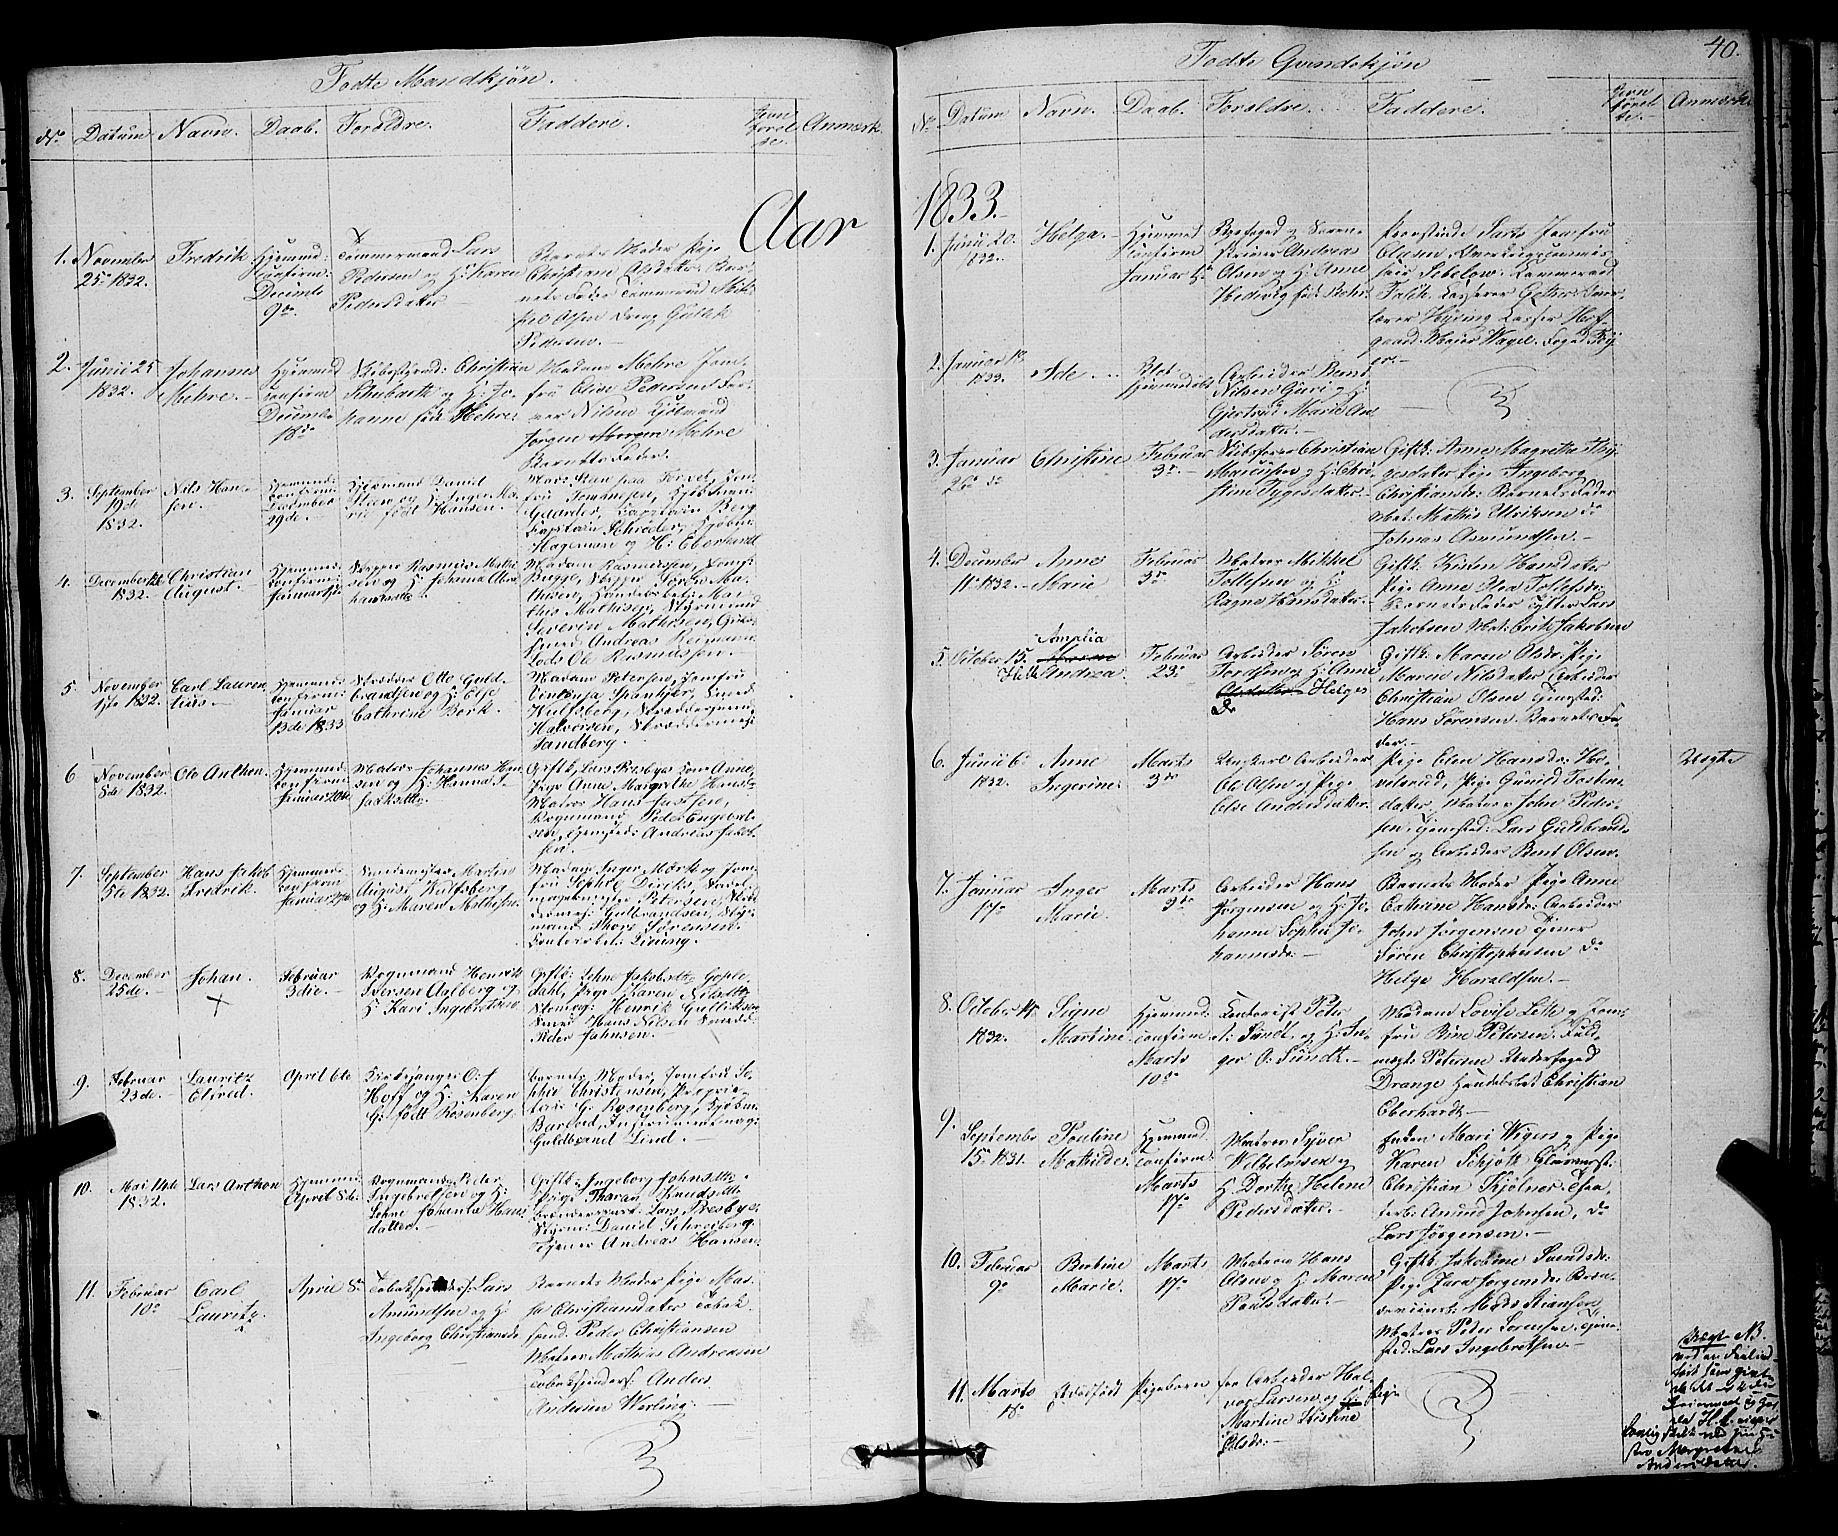 SAKO, Larvik kirkebøker, F/Fa/L0002: Ministerialbok nr. I 2, 1825-1847, s. 40